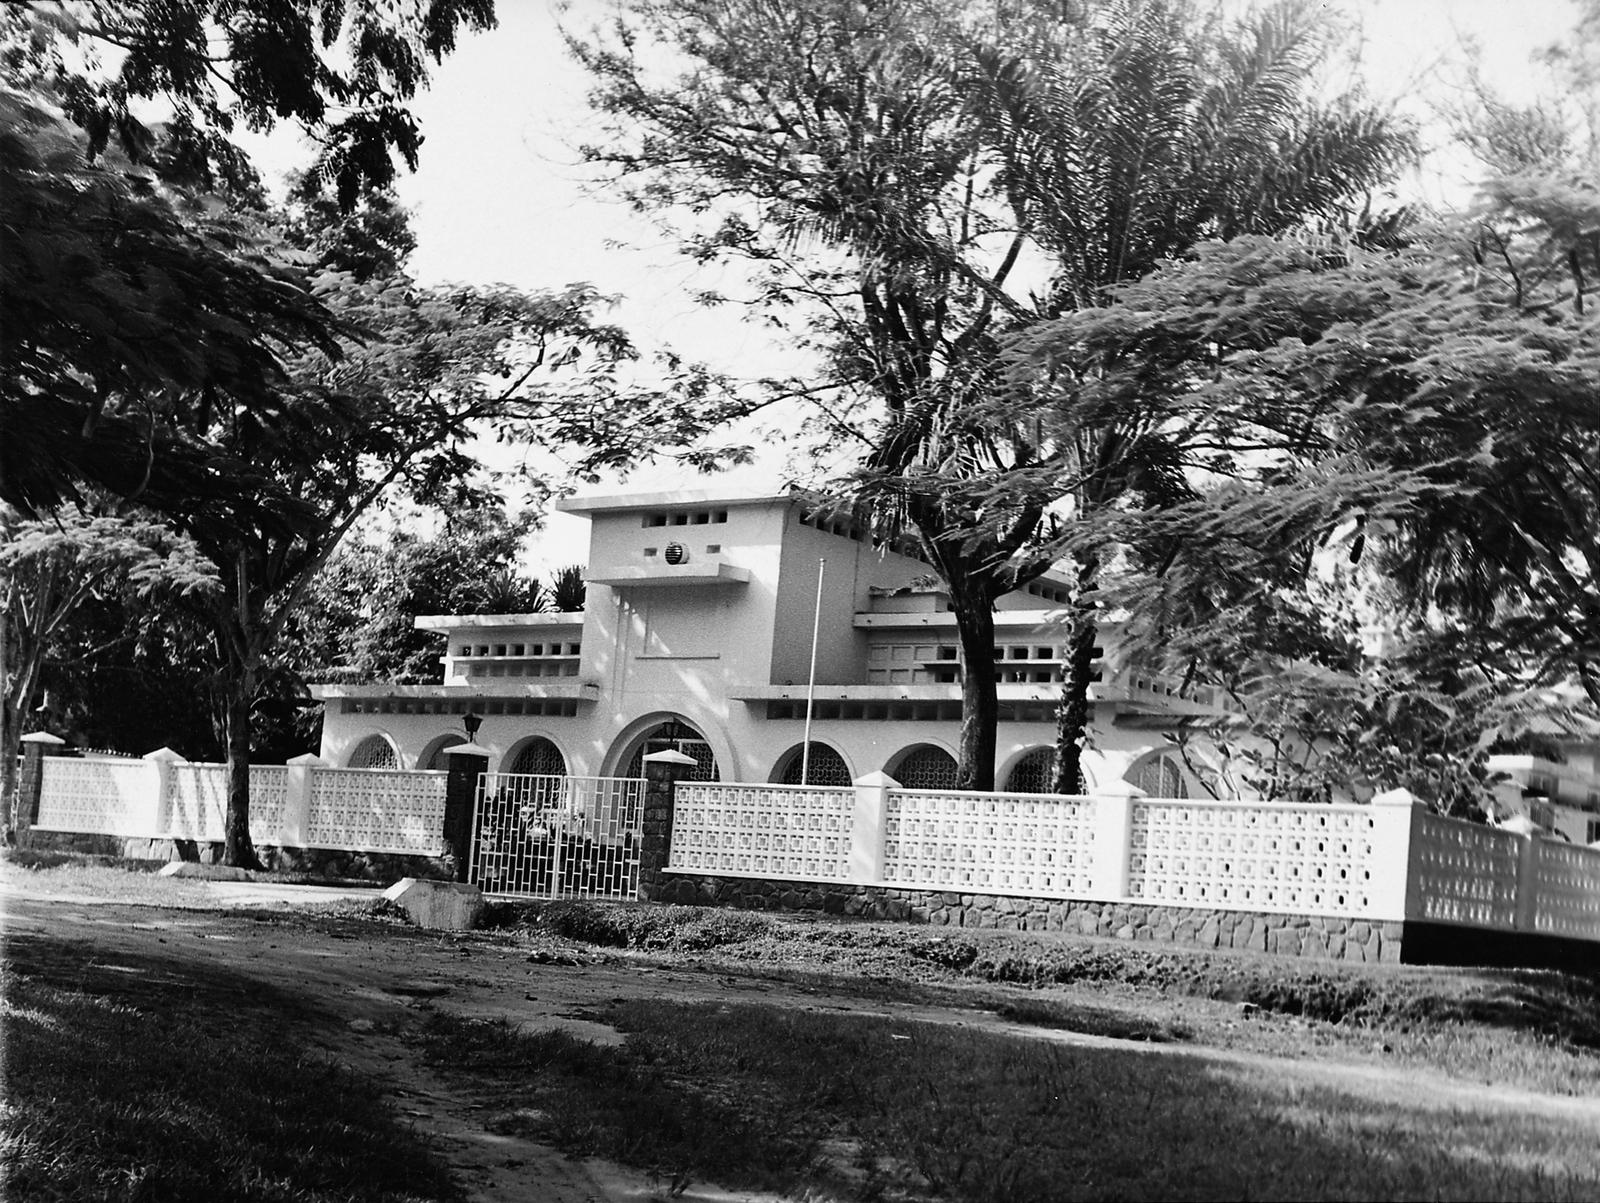 Kinshasa - Mid-Level Position Residence - 1971